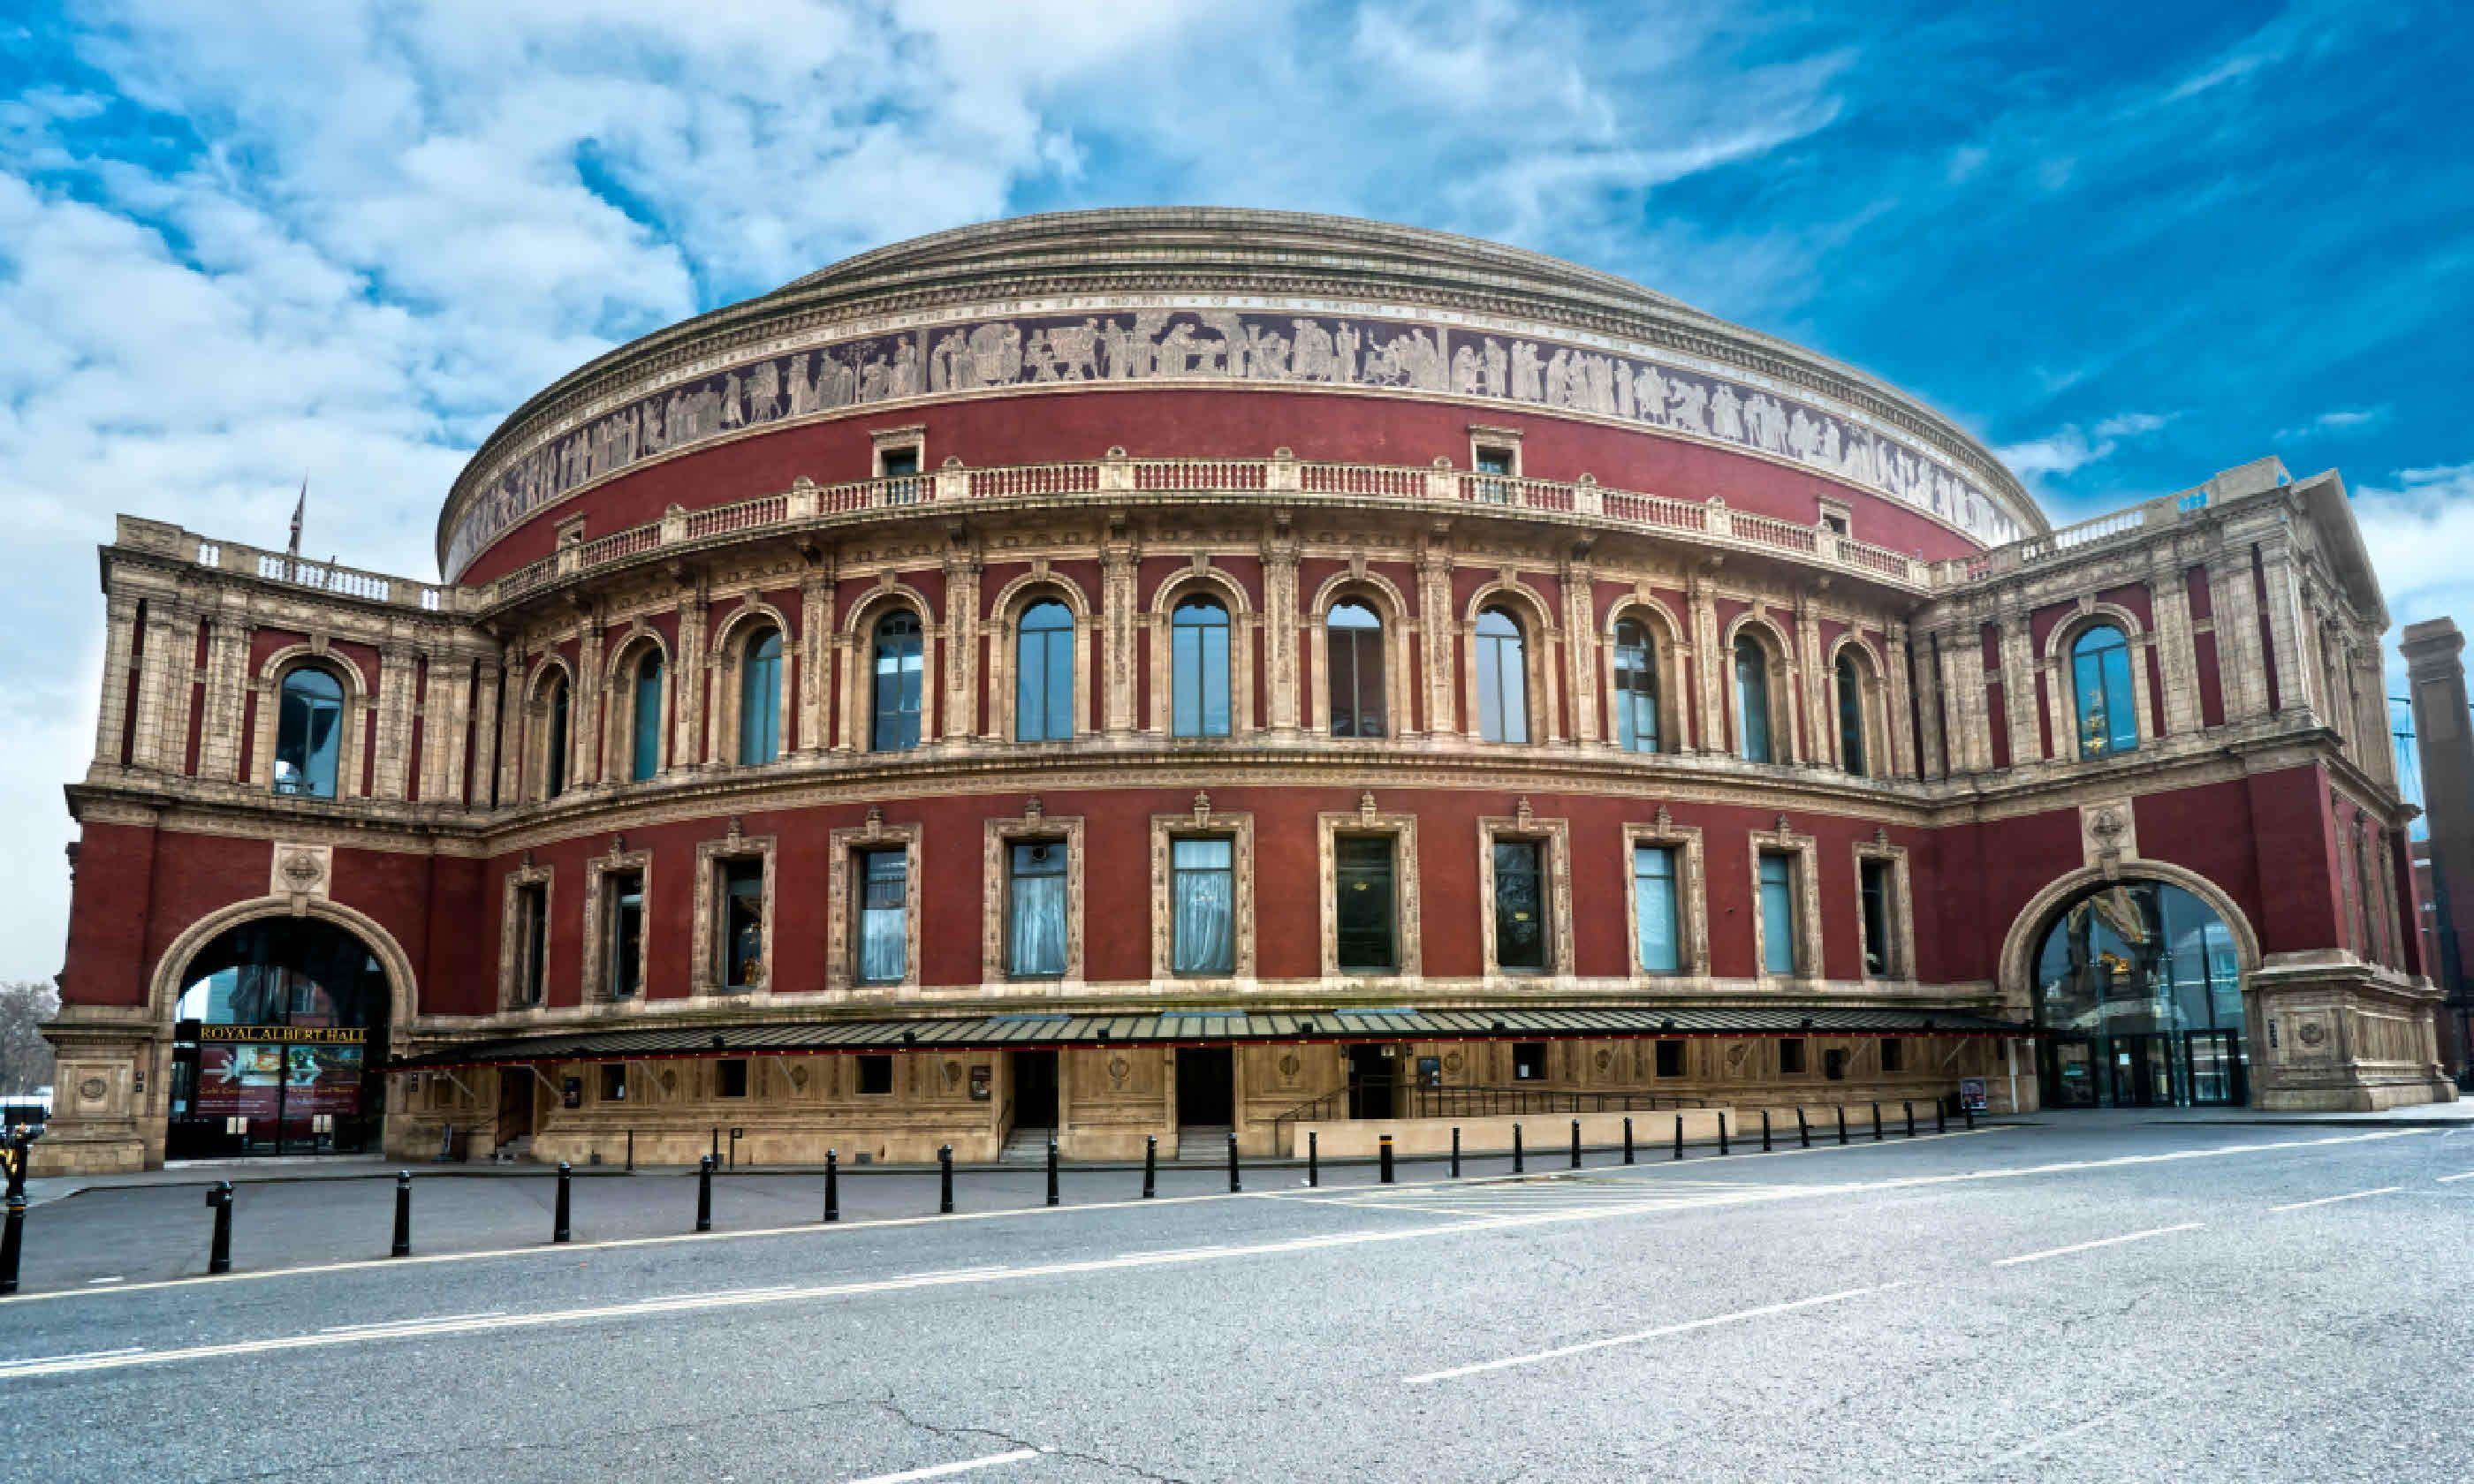 Royal Albert Hall, London (Shutterstock)